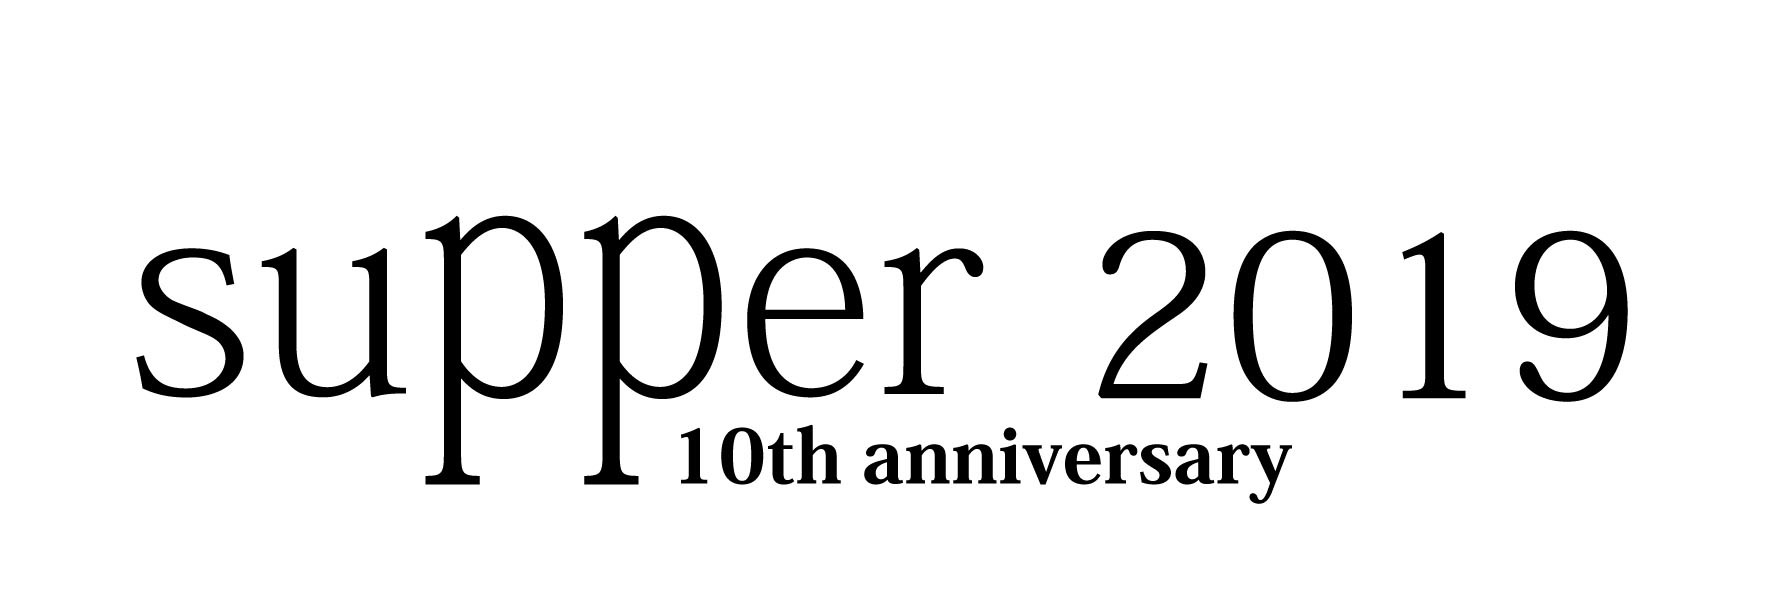 Thank you 10th anniversary 2011 SUPPER_b0101300_16071728.jpg